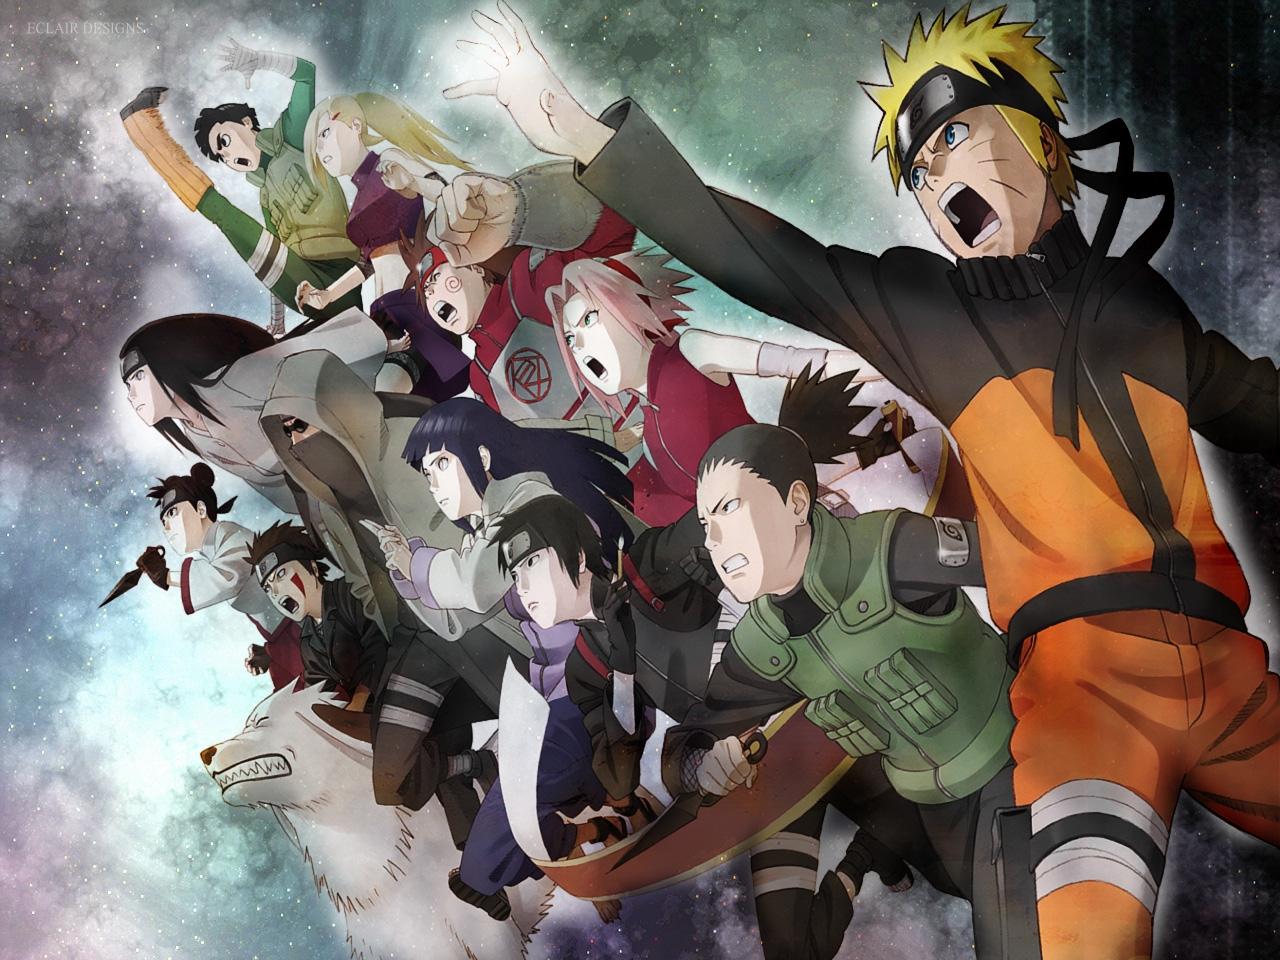 Naruto Group Wallpaper on WallpaperSafari